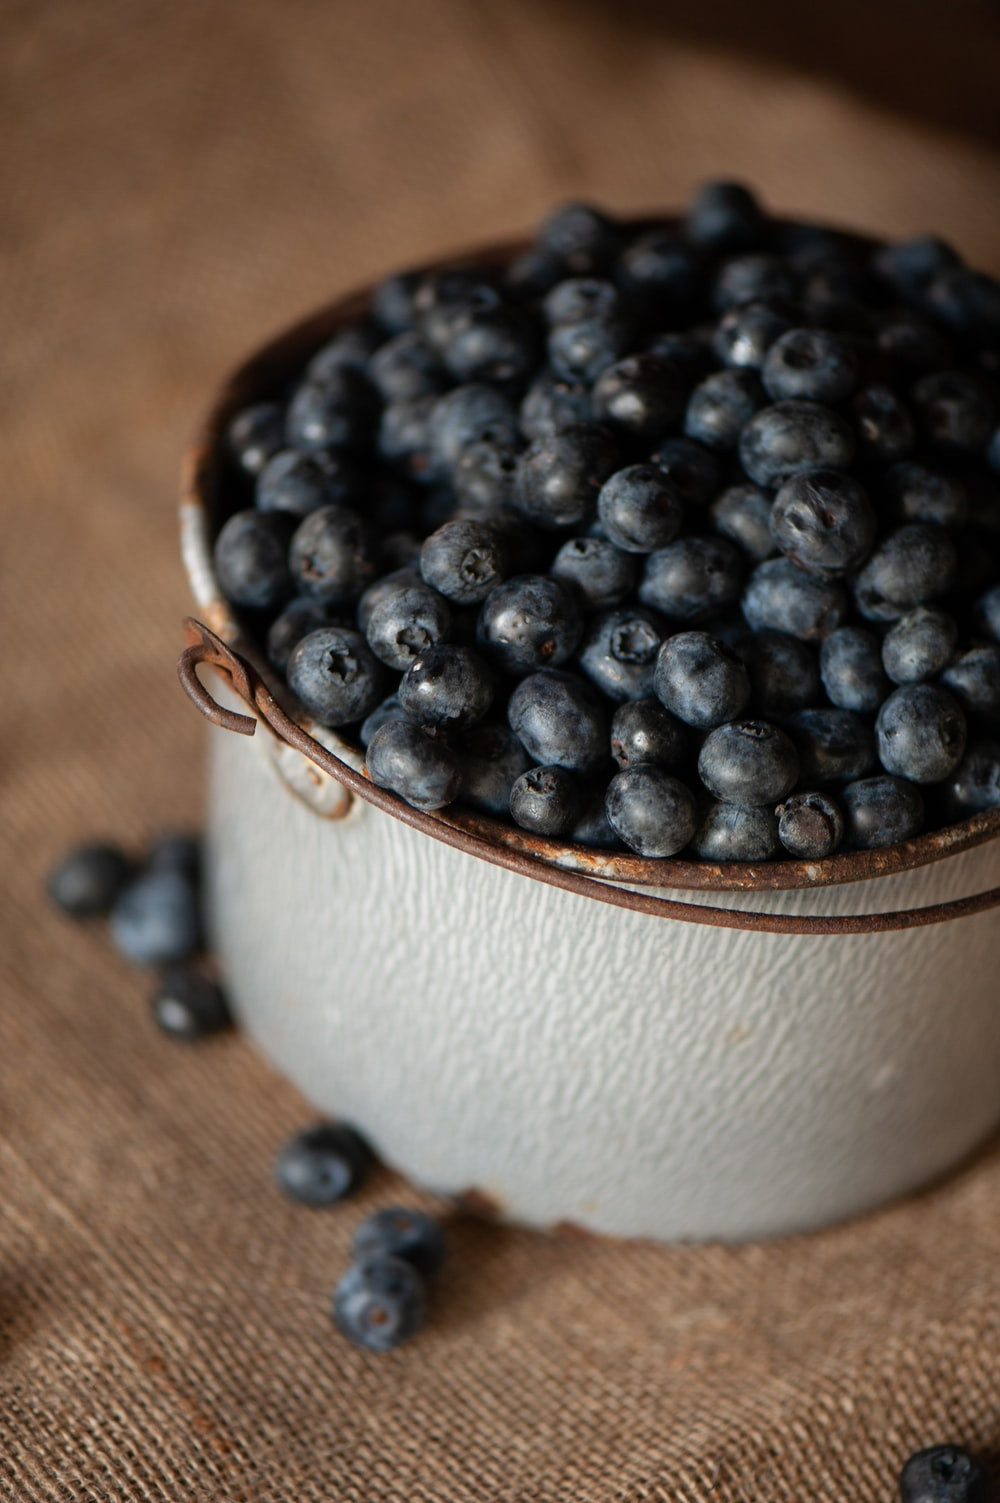 black berries in white round ceramic bowl